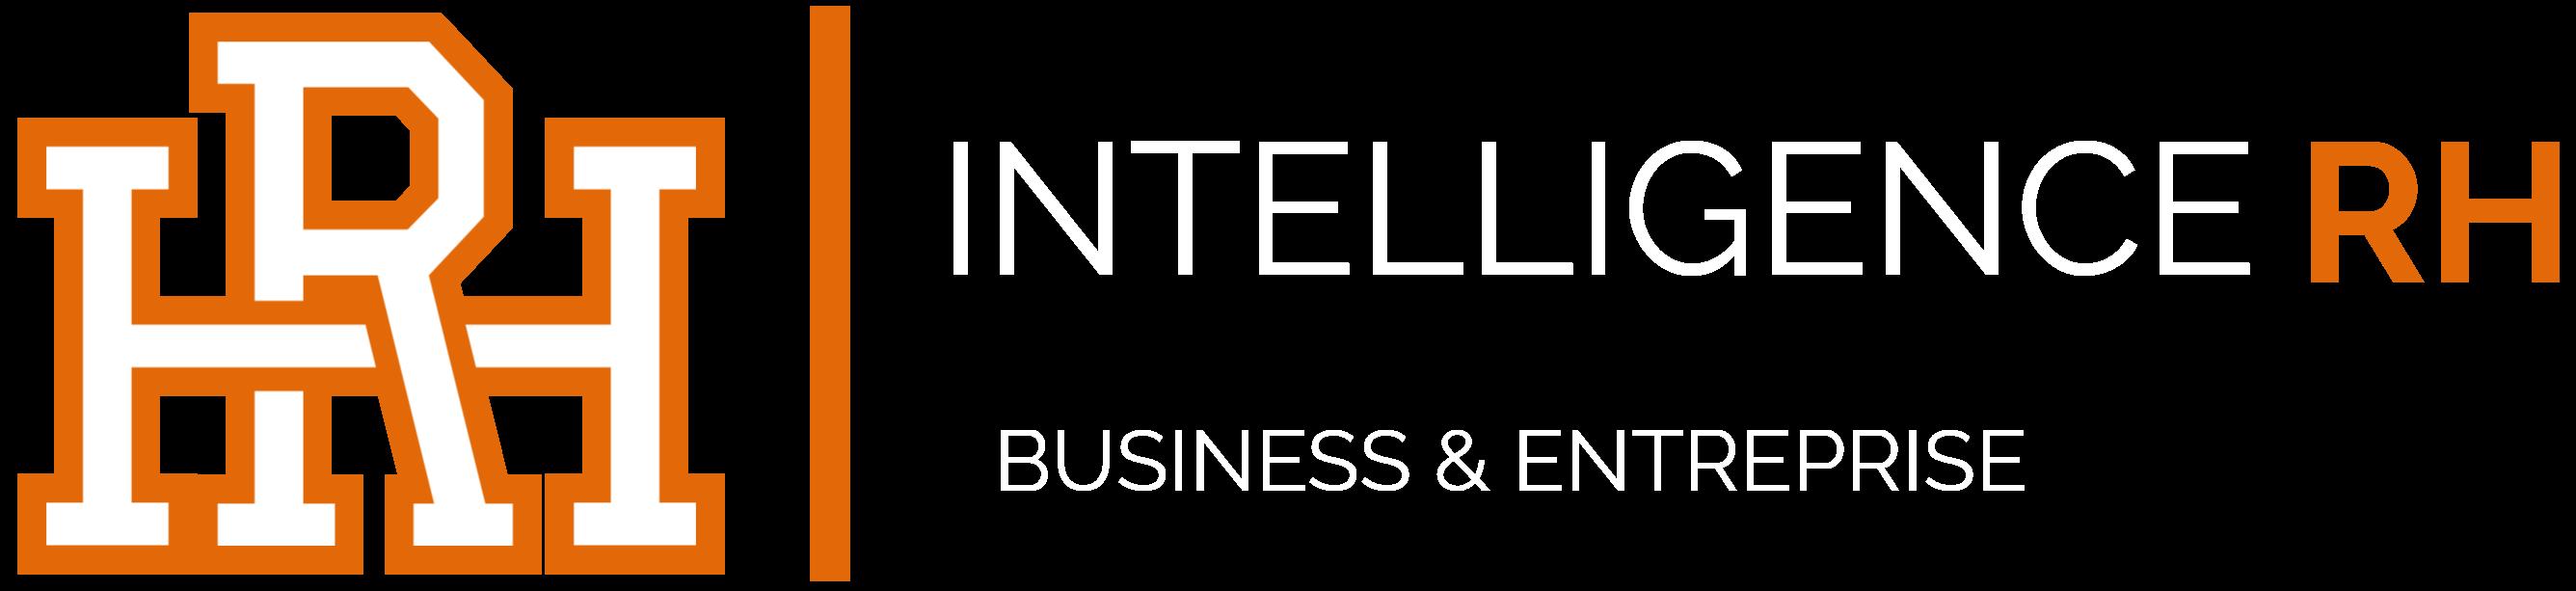 Intelligence RH